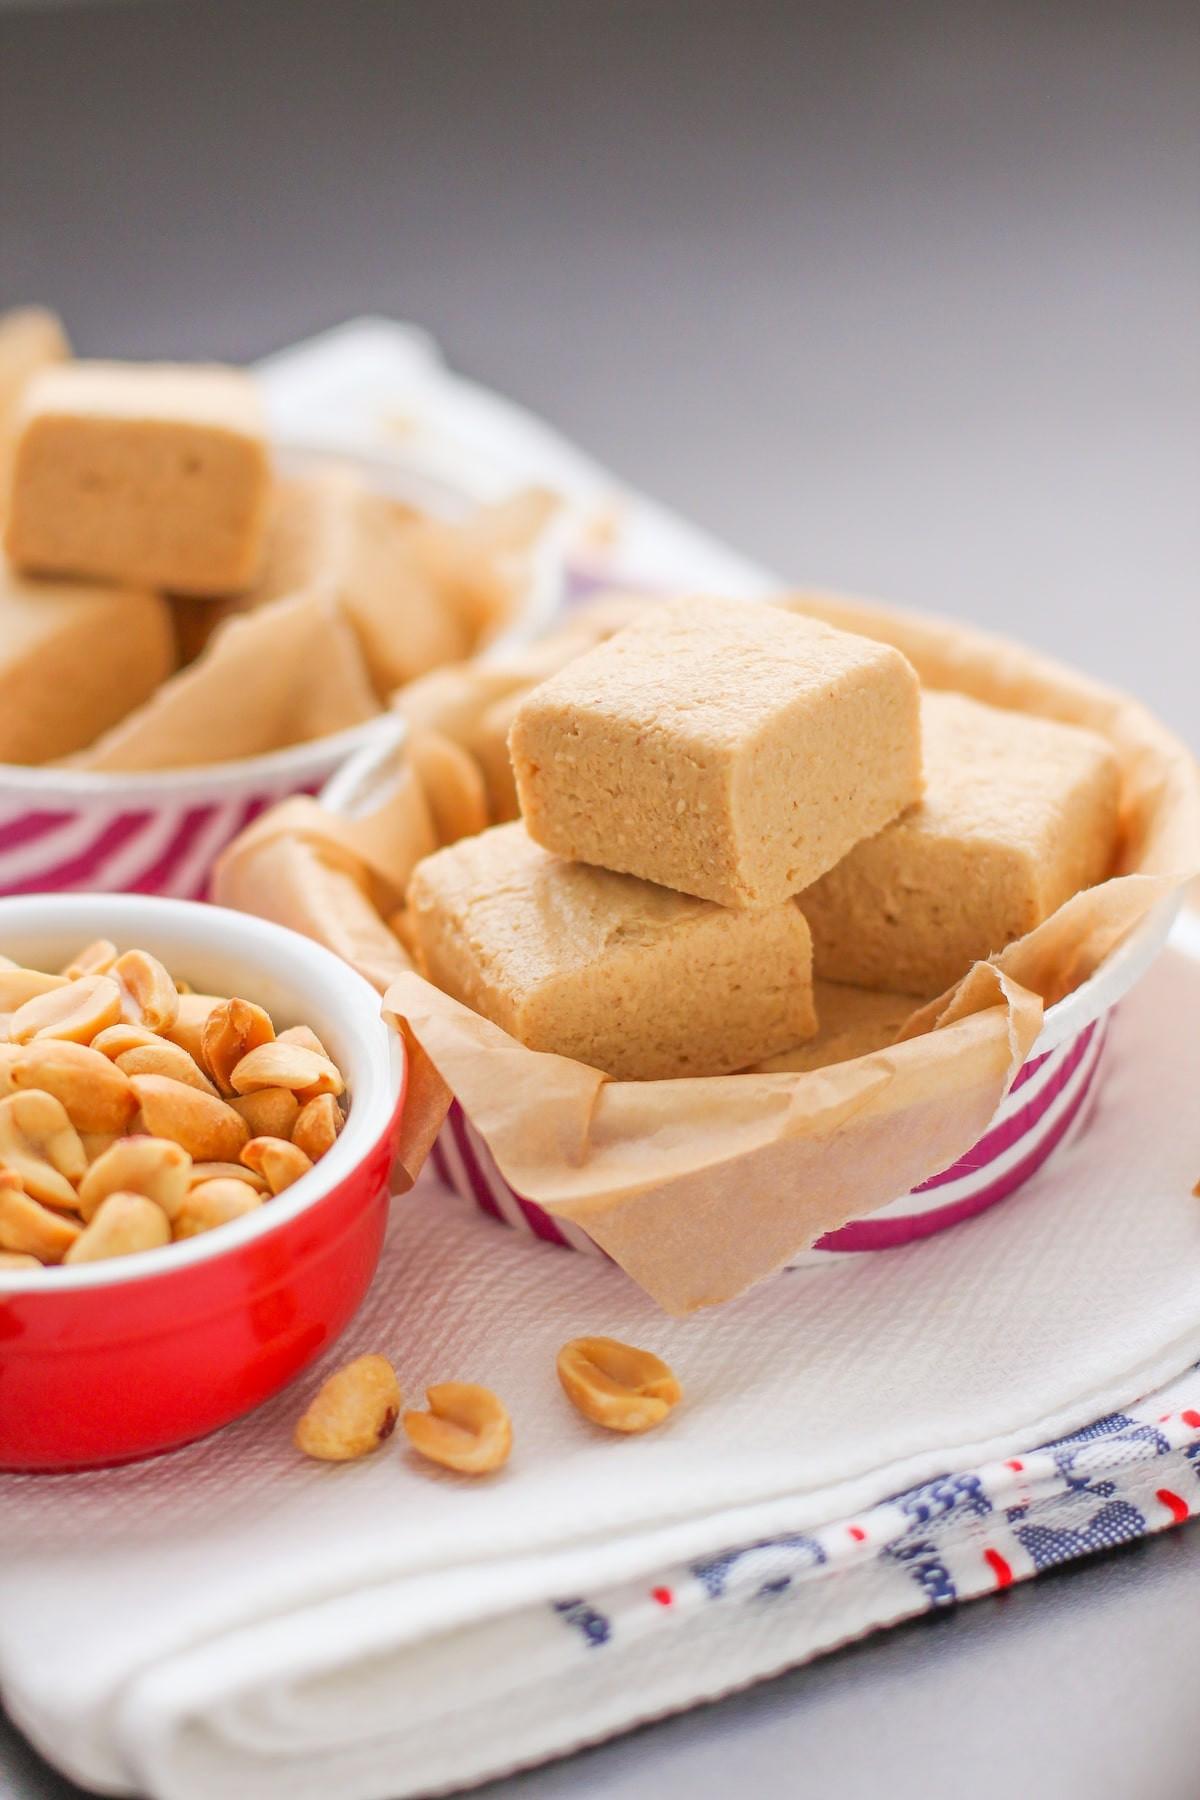 Healthy Peanut Butter Cookies 35 Calories  Healthy 35 calorie Peanut Butter Fudge sugar free low